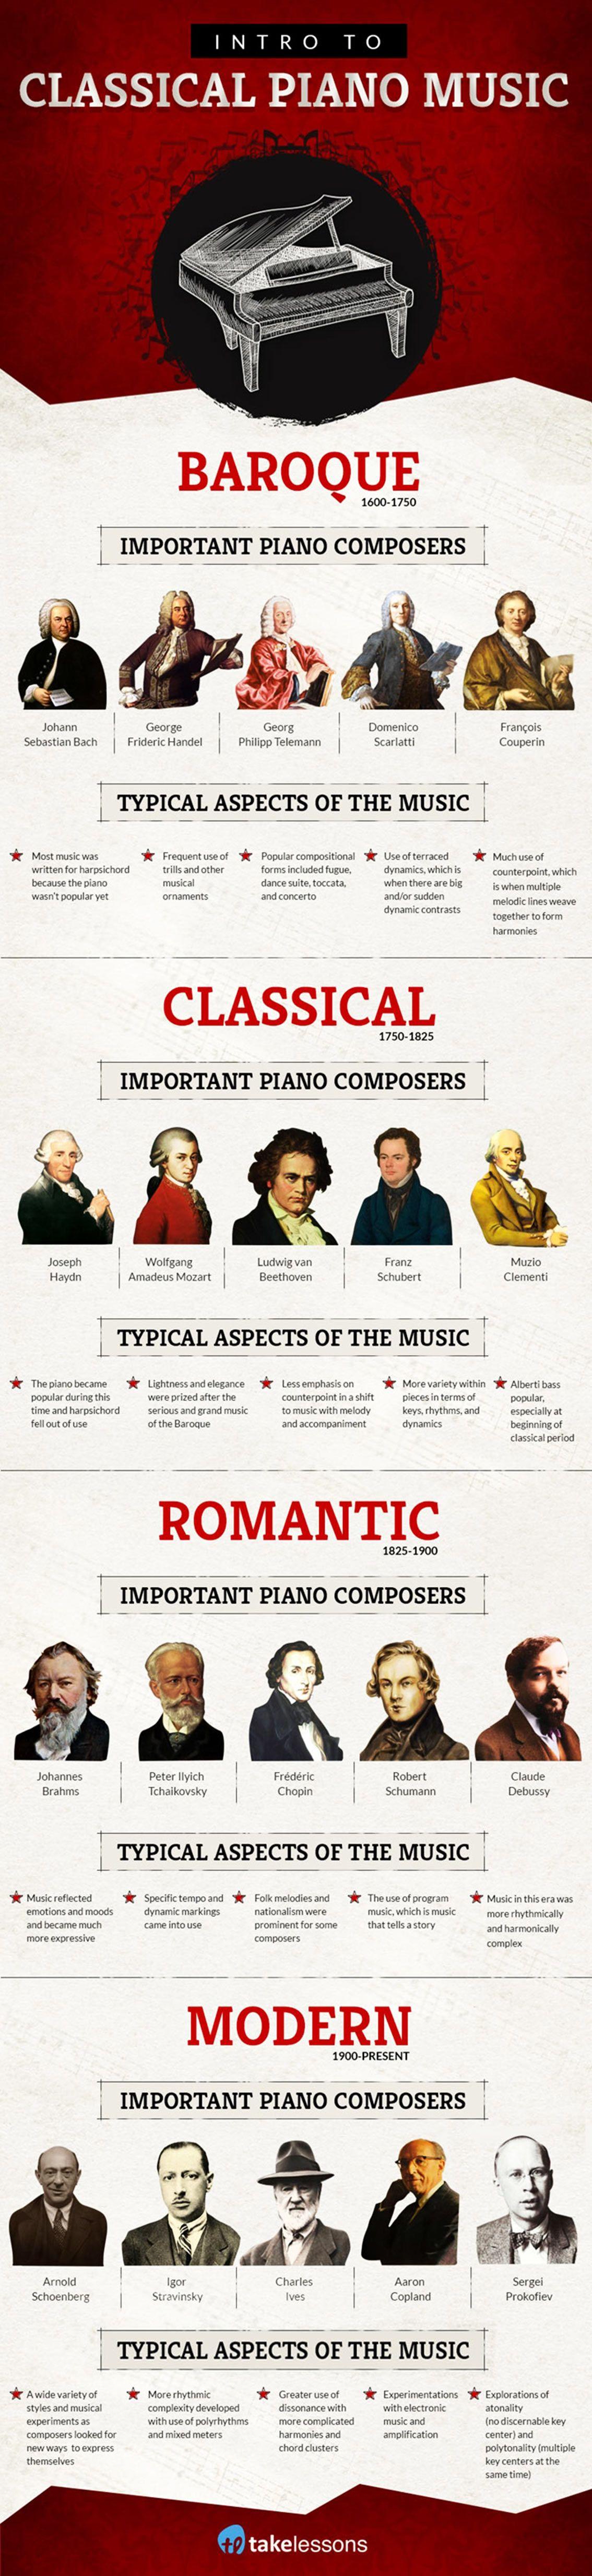 Characteristics of Romantic Era Music - CMUSE